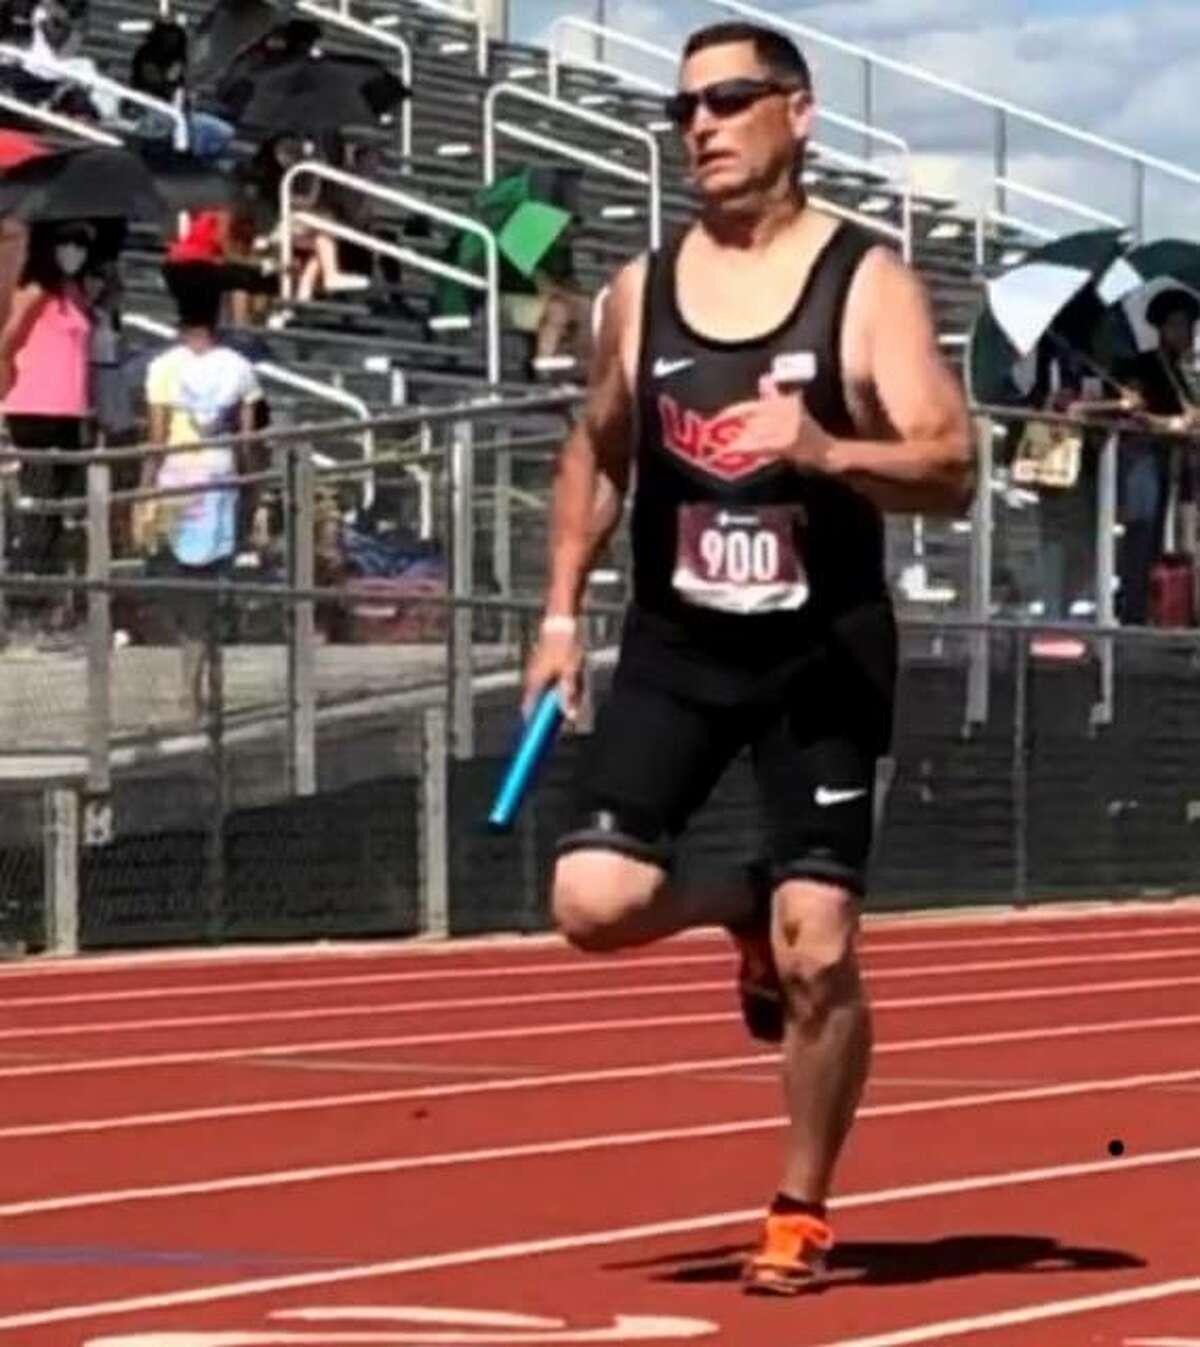 Mike Young of Wood River runs his leg of the 4 x 100 relay Sunday at the Atlanta International Relays meet at McDonough County High School in suburban Atlanta.